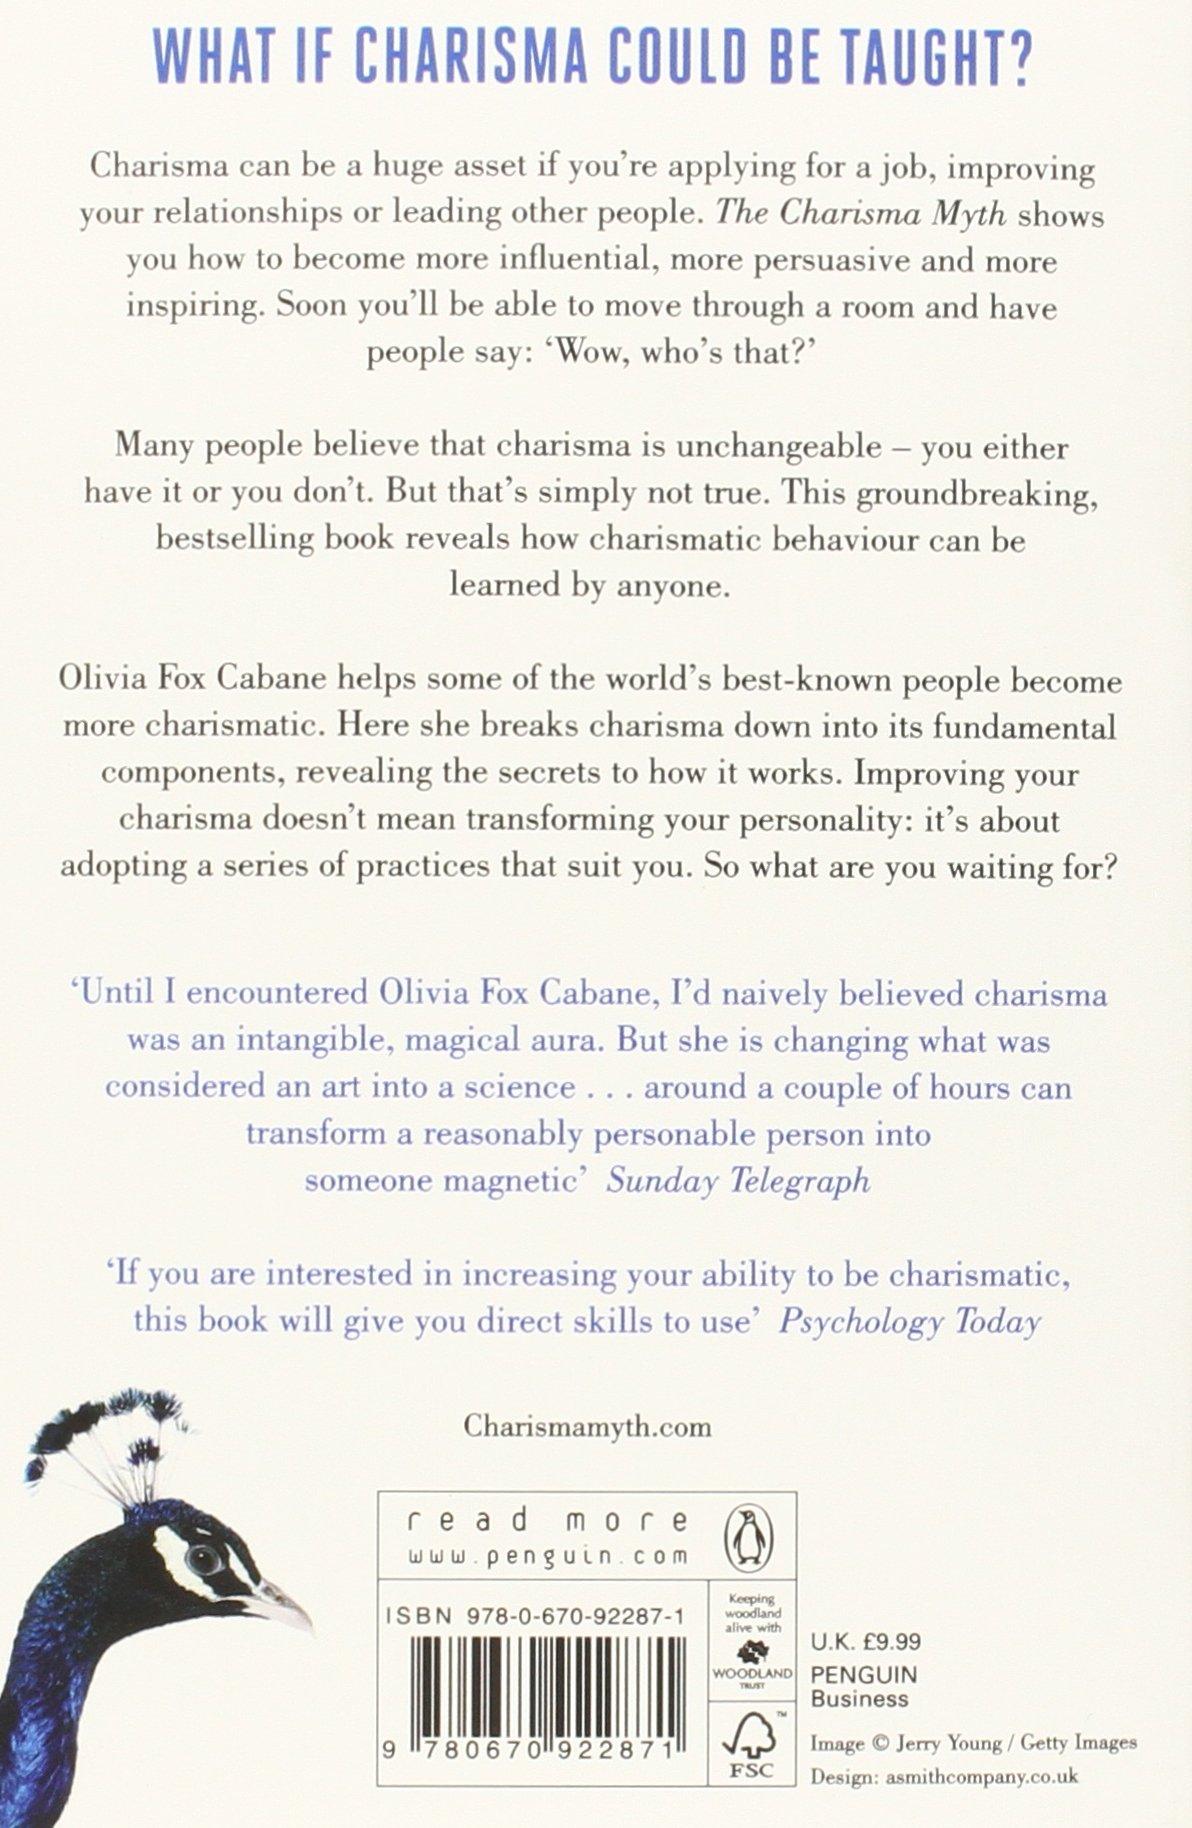 Charisma myth pdf